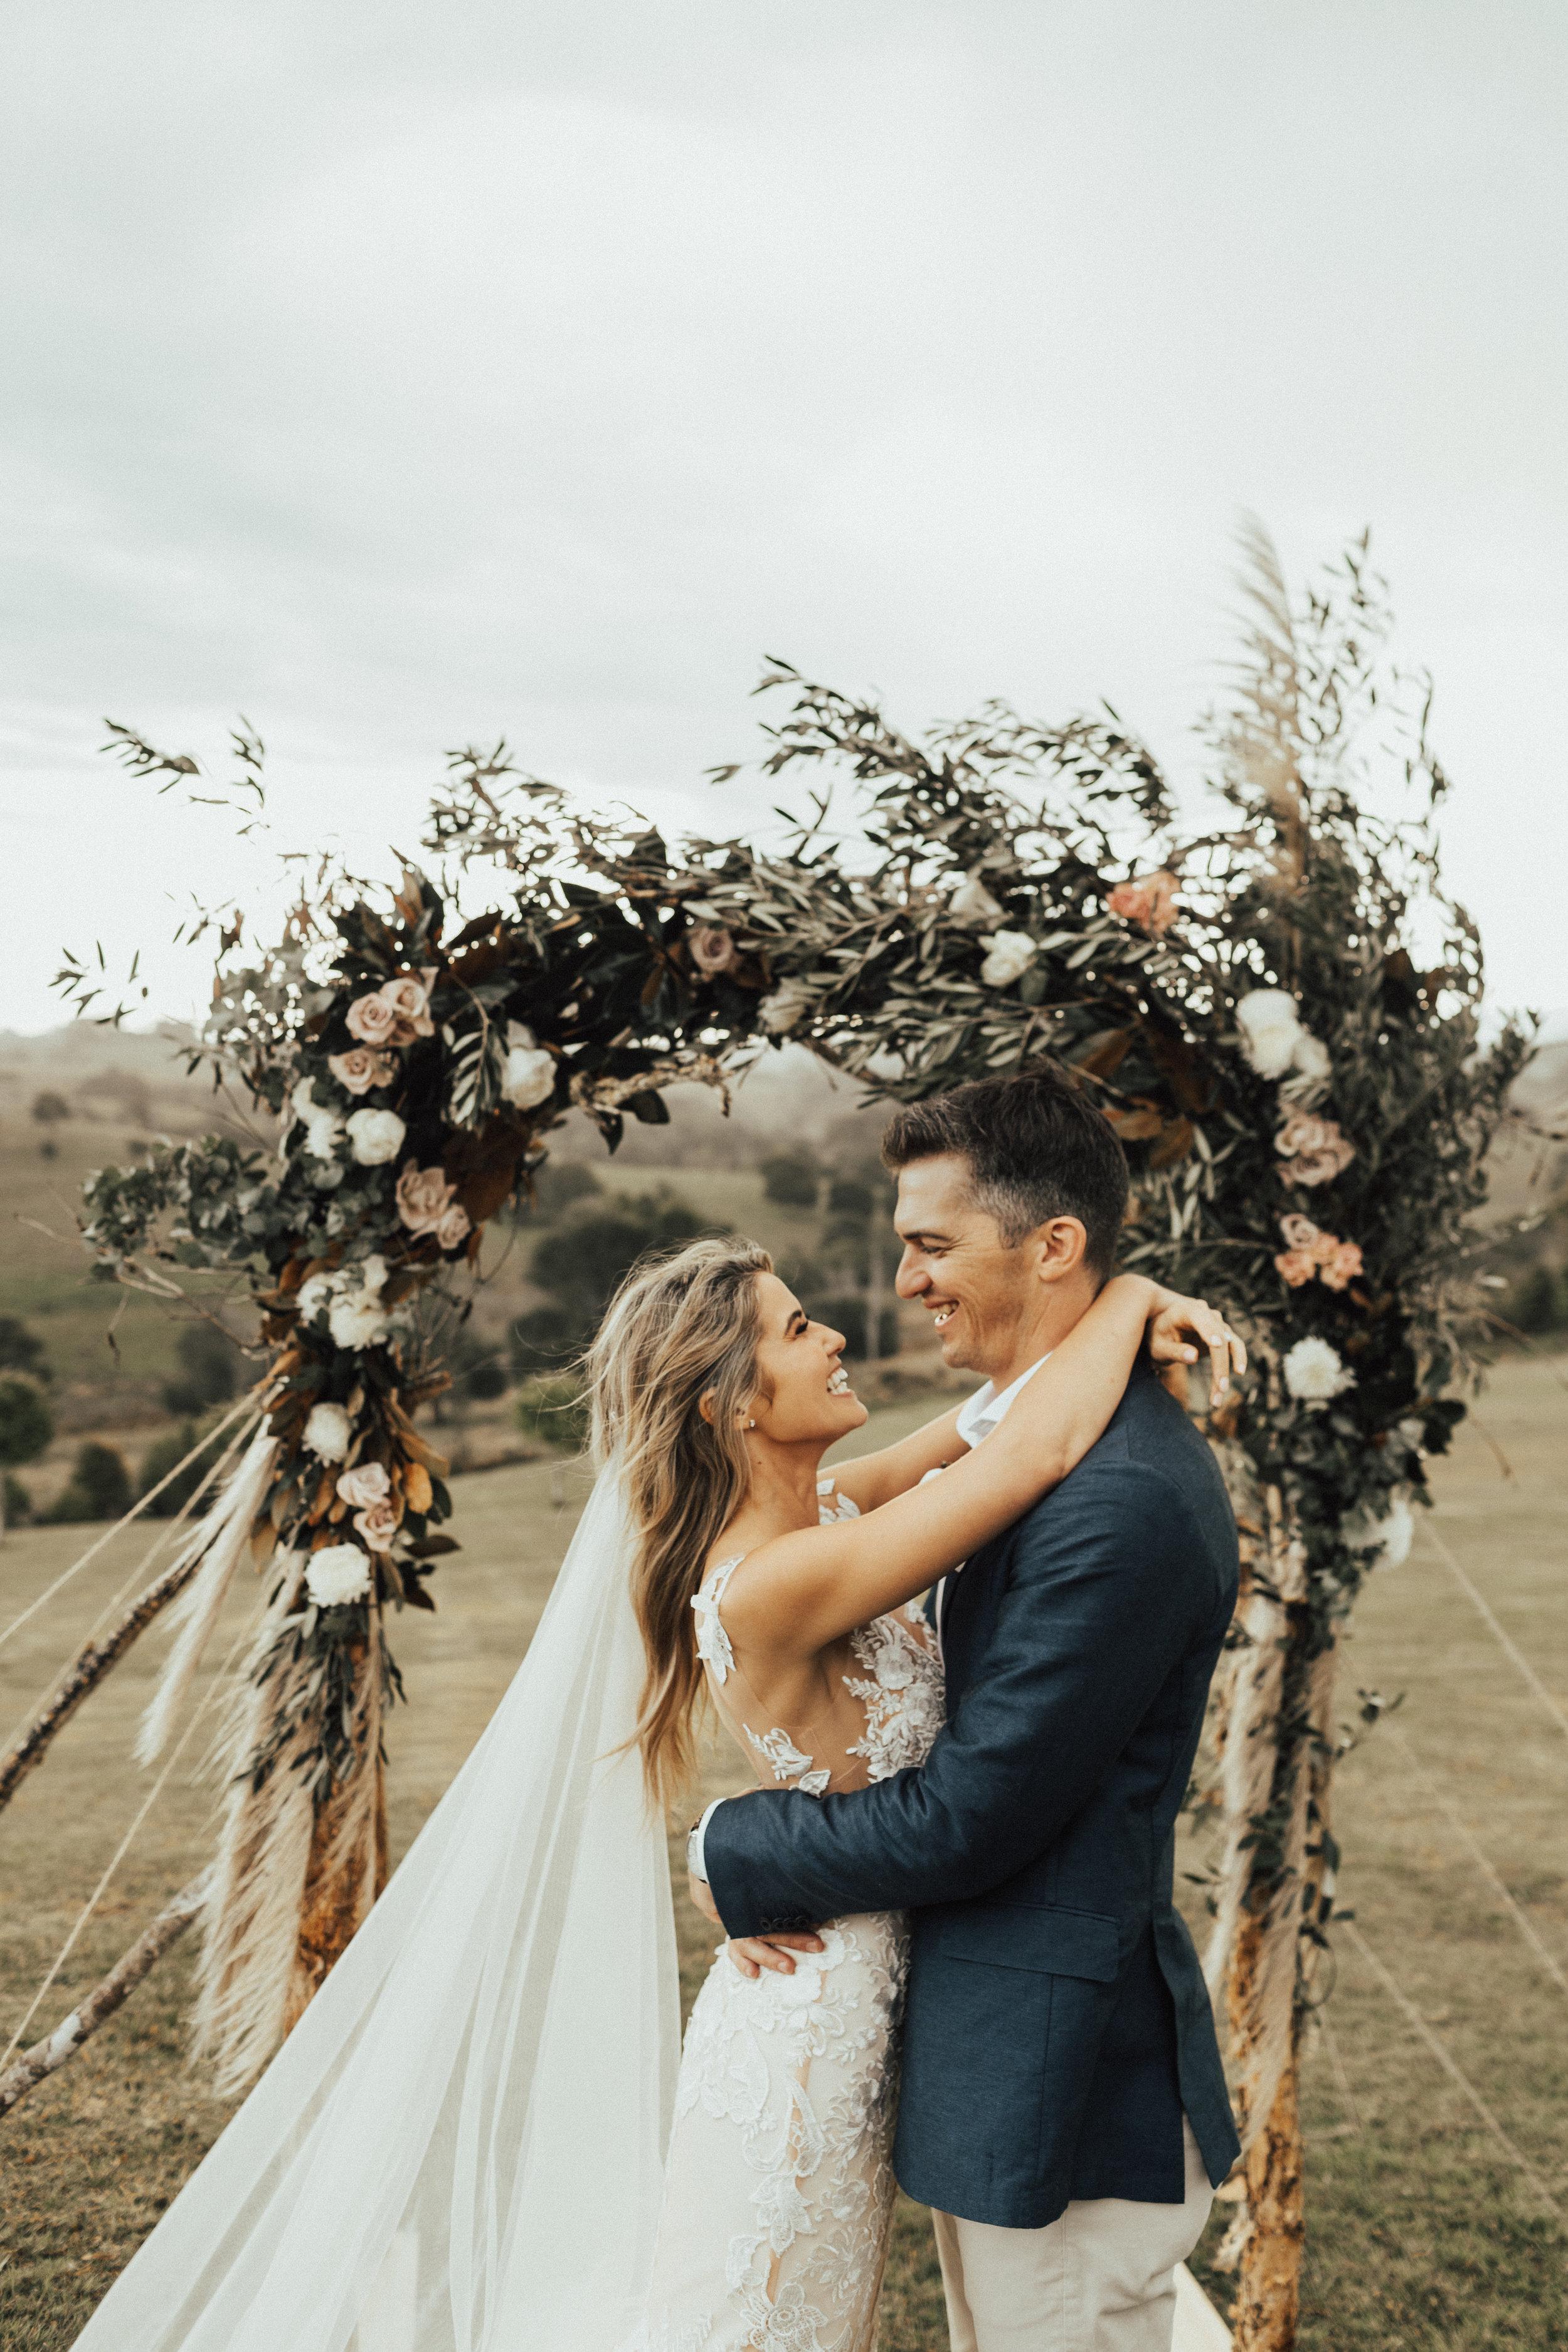 LAURA & MATT / BYRON ABY HINTERLAND